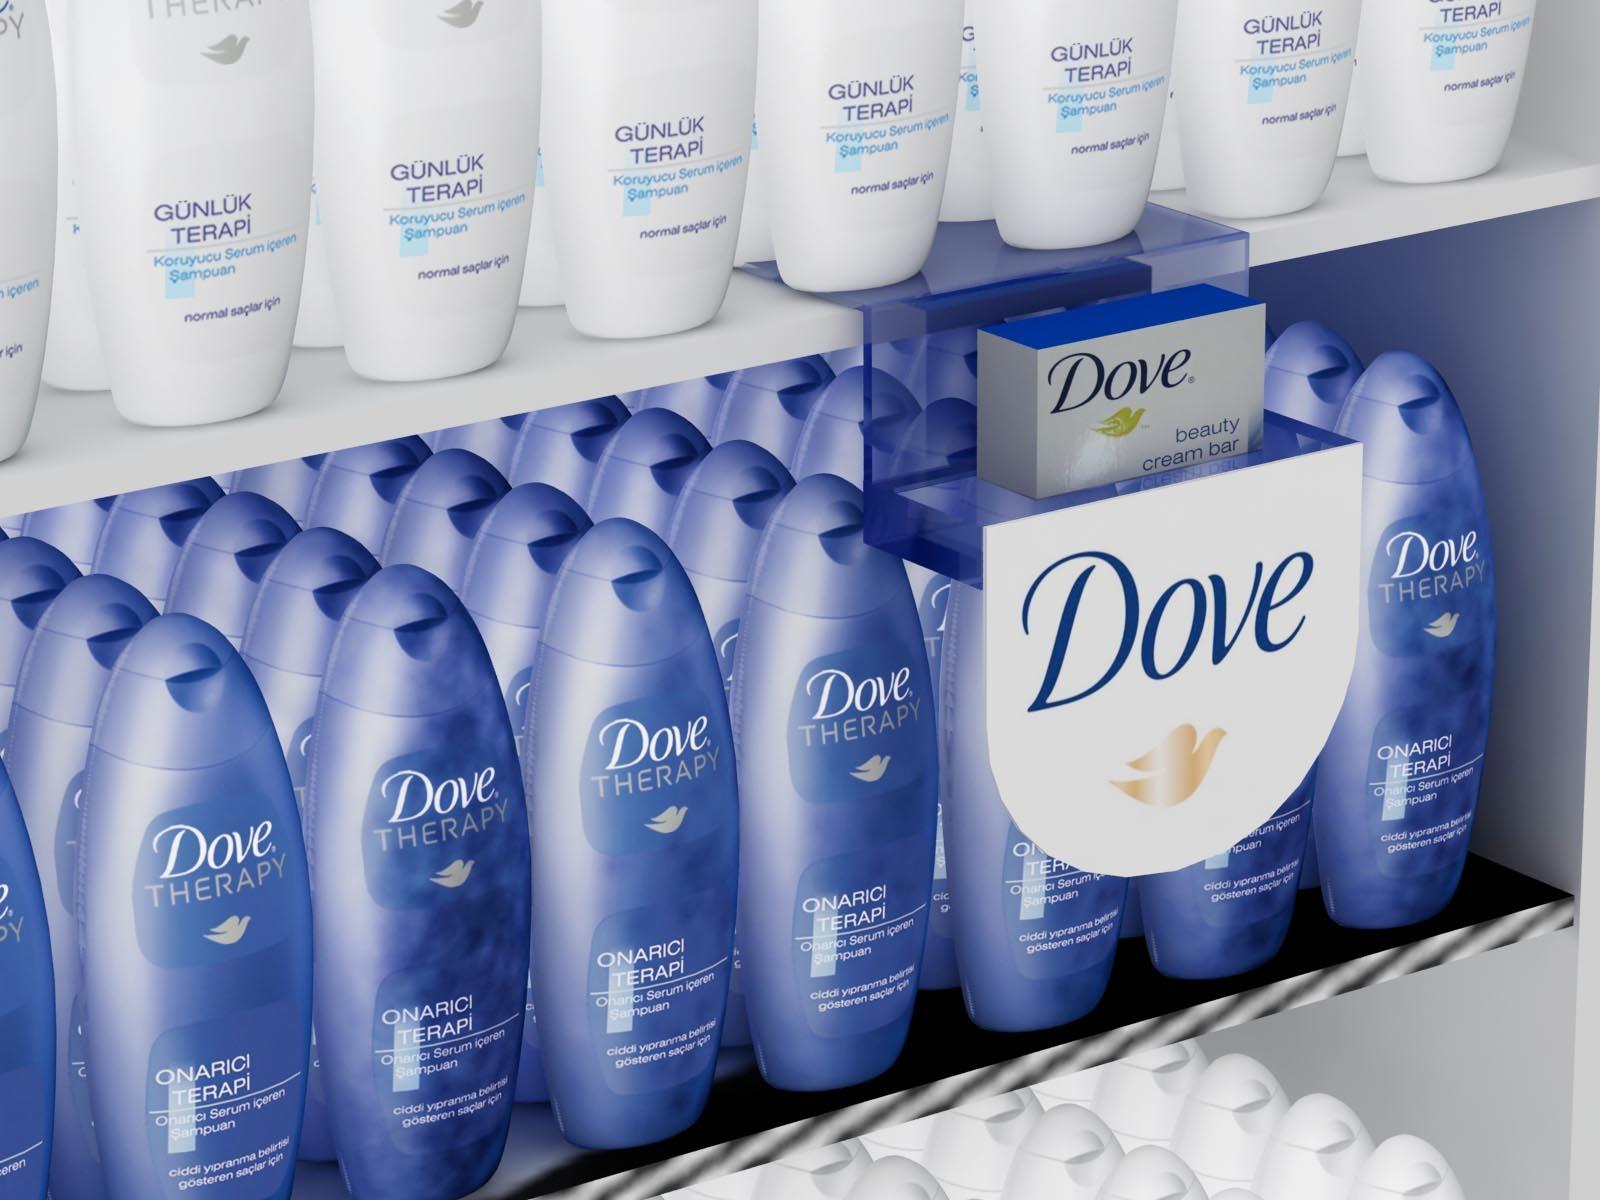 Dove Coupons (Soap, Body Wash, Deodorant) - Printable Coupons 2018 - Free Dove Soap Coupons Printable